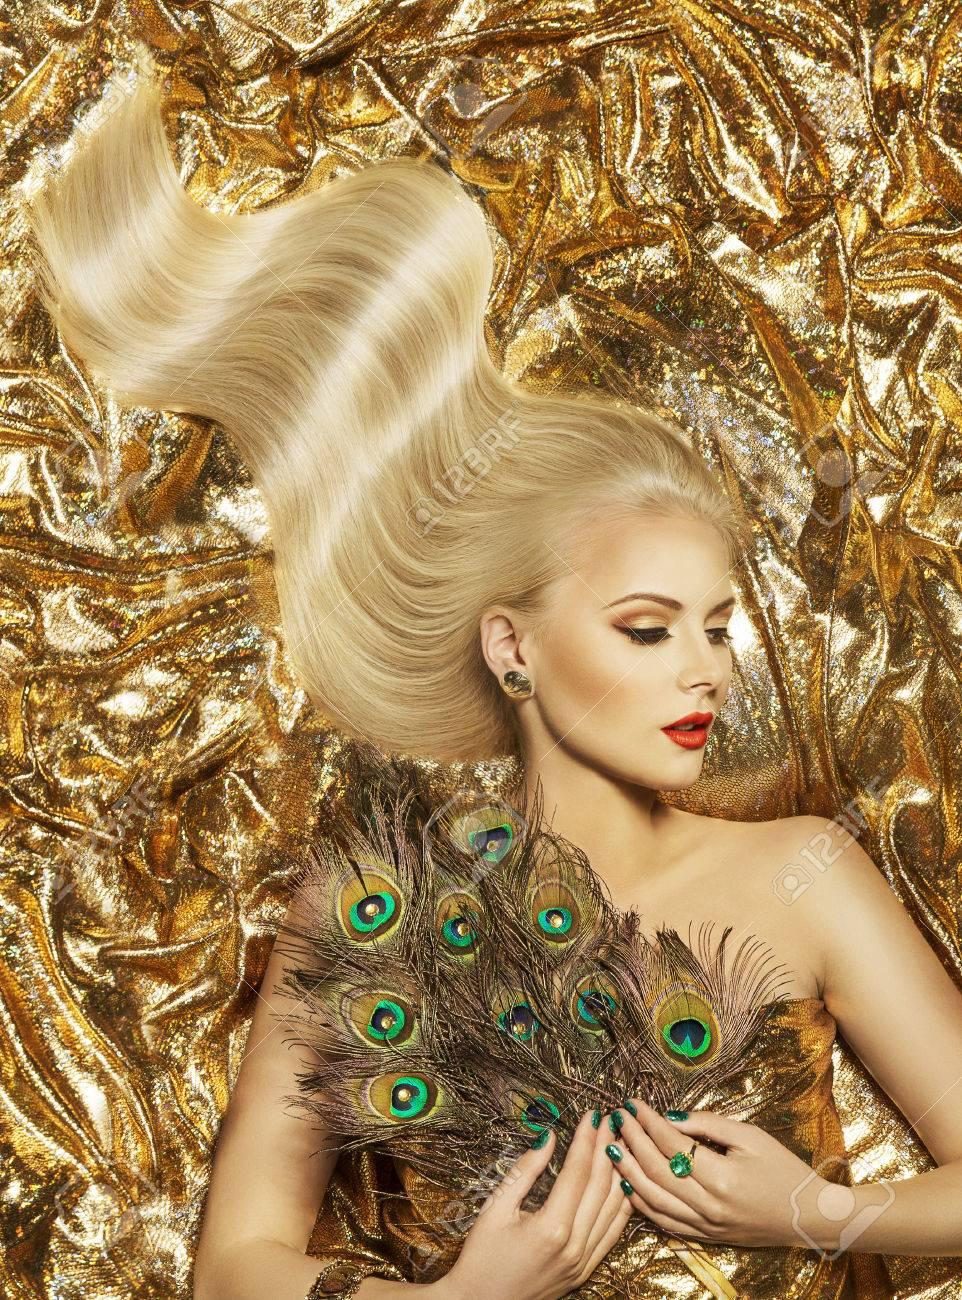 Haar Welle Mode Modell Goldene Frisur Schonheit Langes Blondes